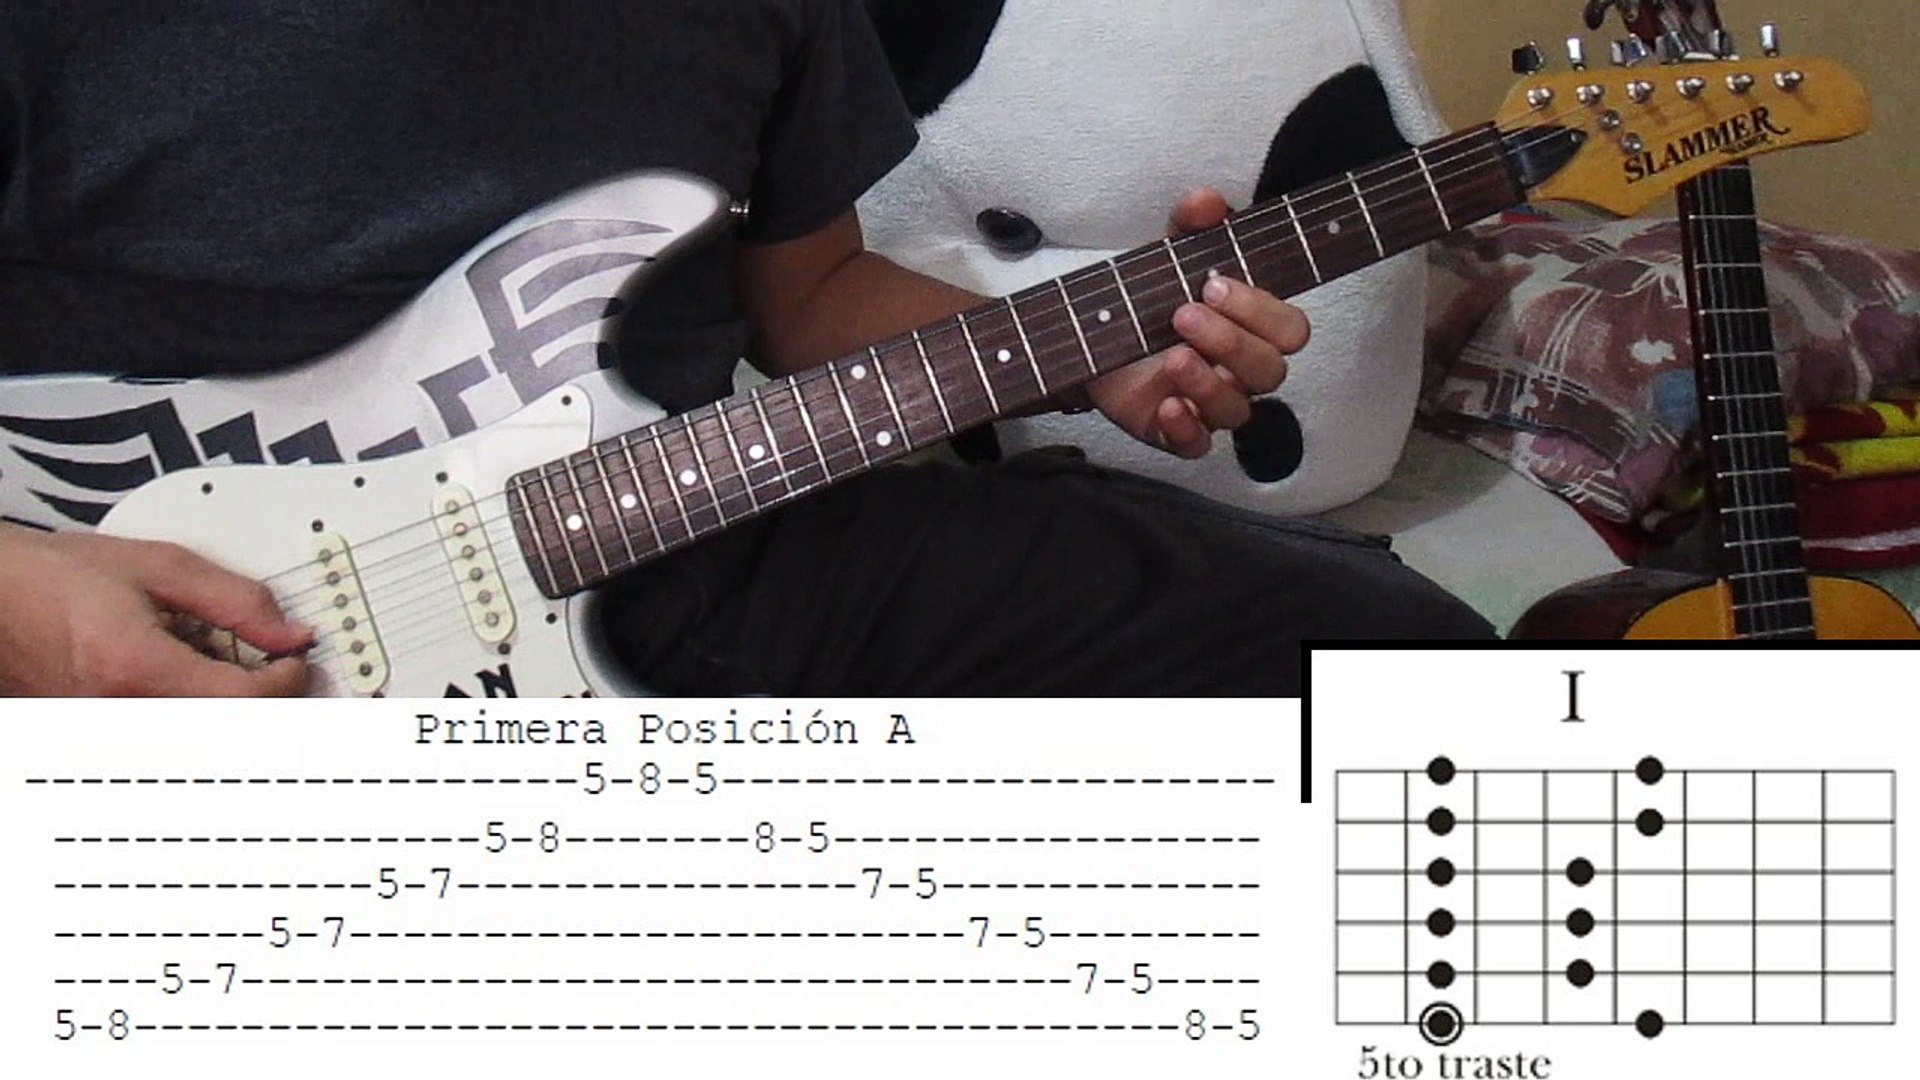 Escalas Pentatonicas Parte 1 Curso De Guitarra Para Principiantes Guitarra Eléctrica